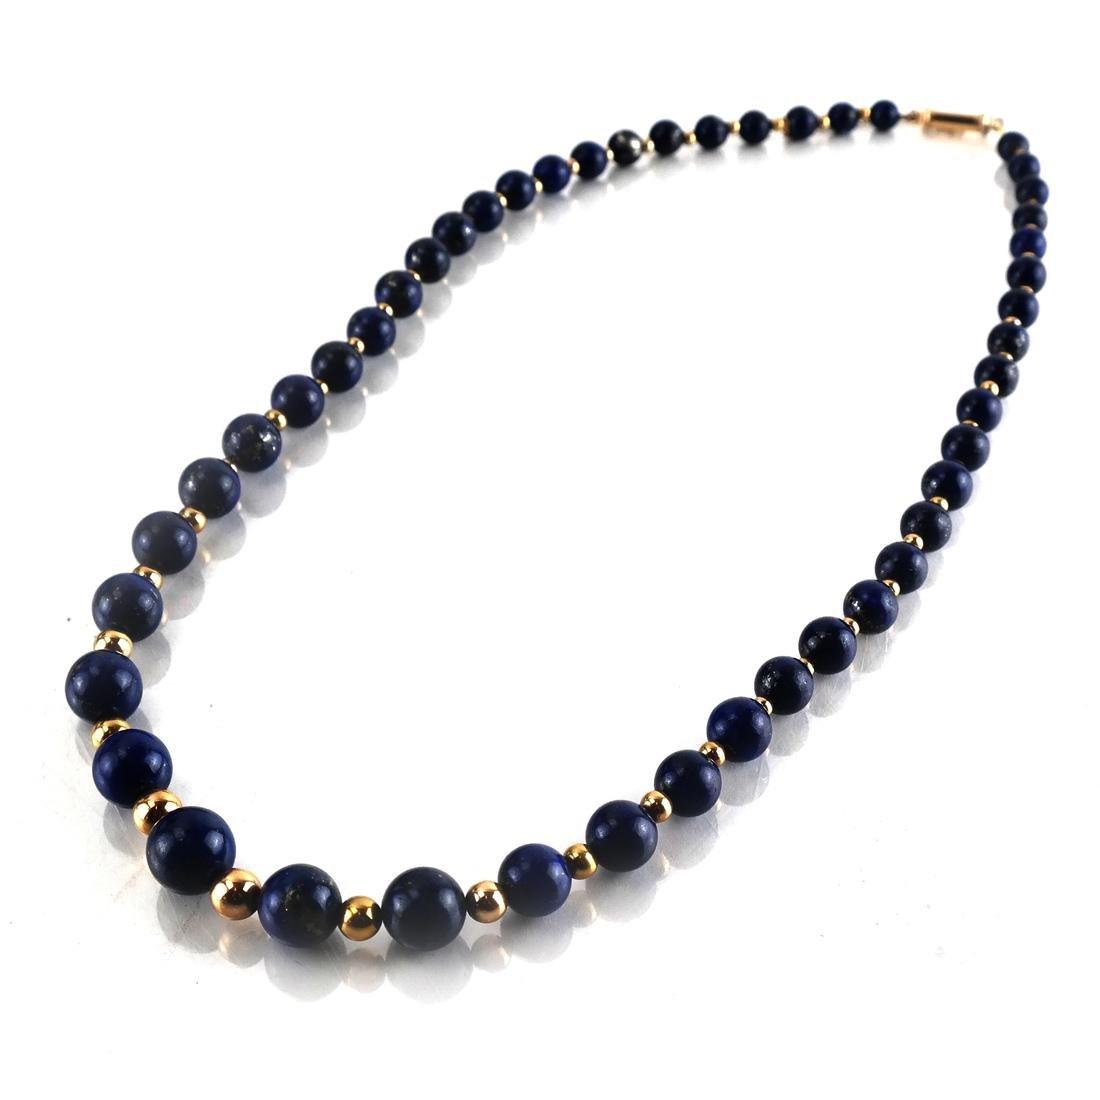 Lapis Graduated Bead & 14k Necklace